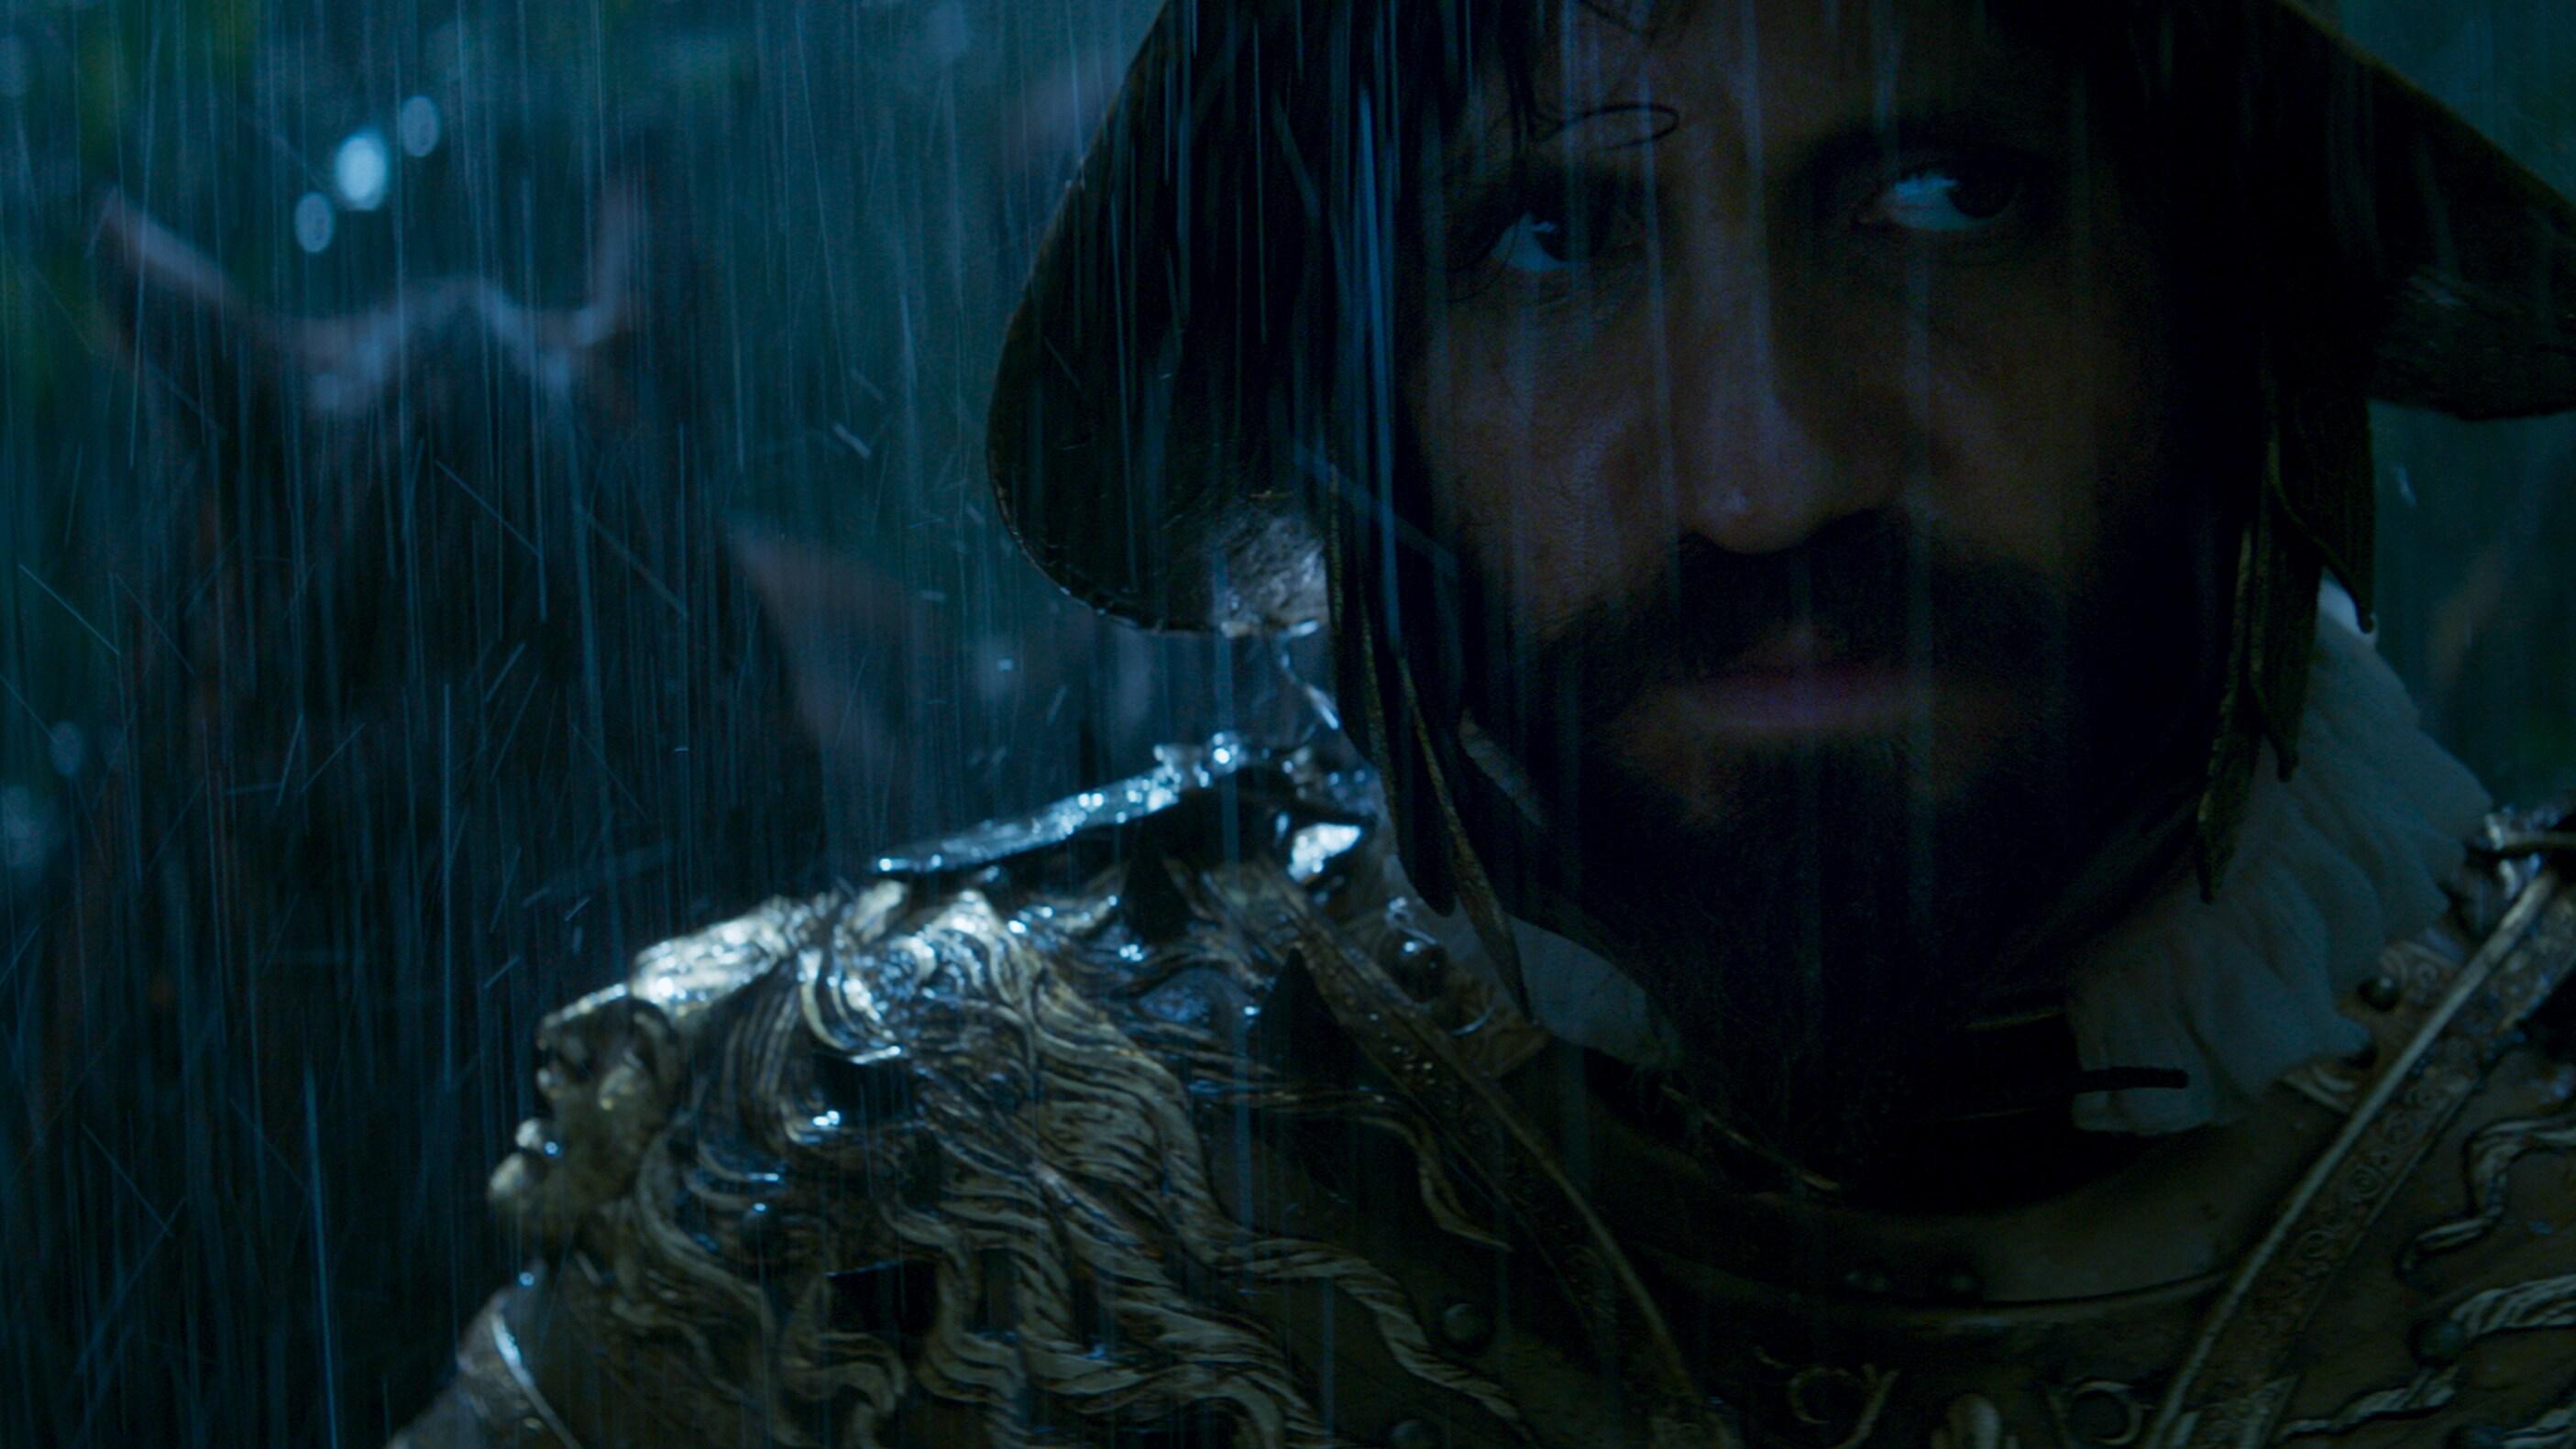 Quim Gutiérrez as Melchor in Disney's live-action JUNGLE CRUISE. Photo courtesy of Disney. © 2021 Disney Enterprises, Inc. All Rights Reserved.